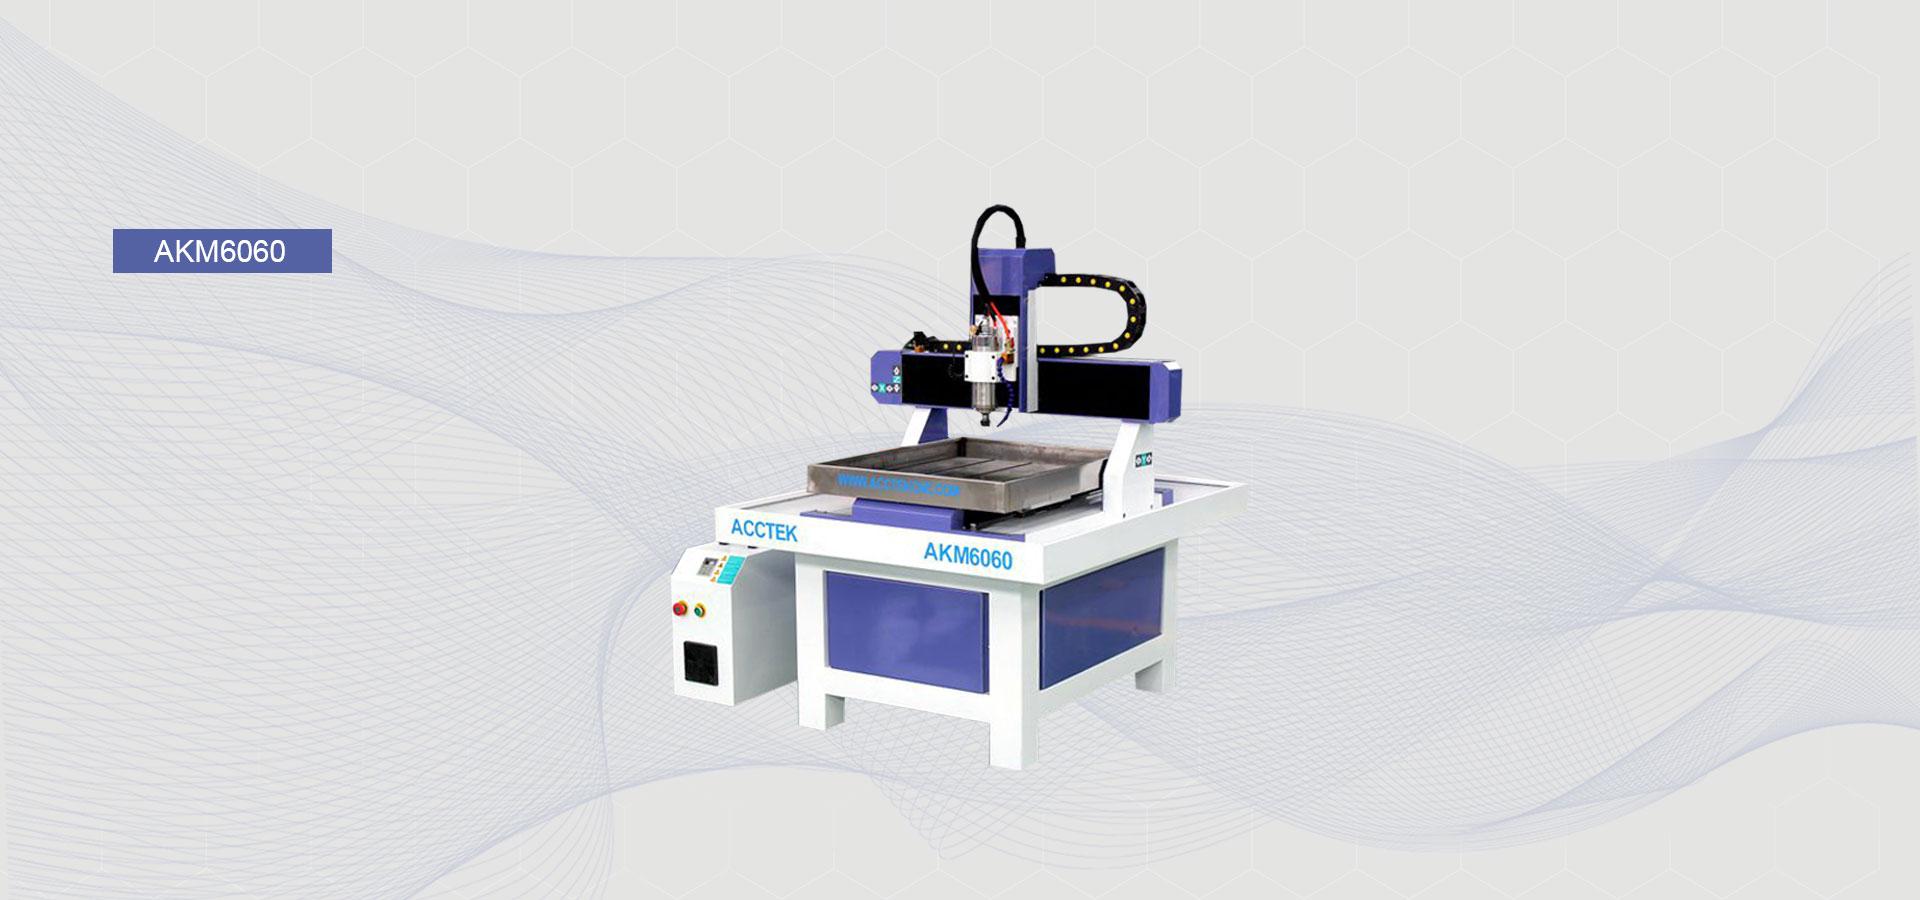 AKM6060